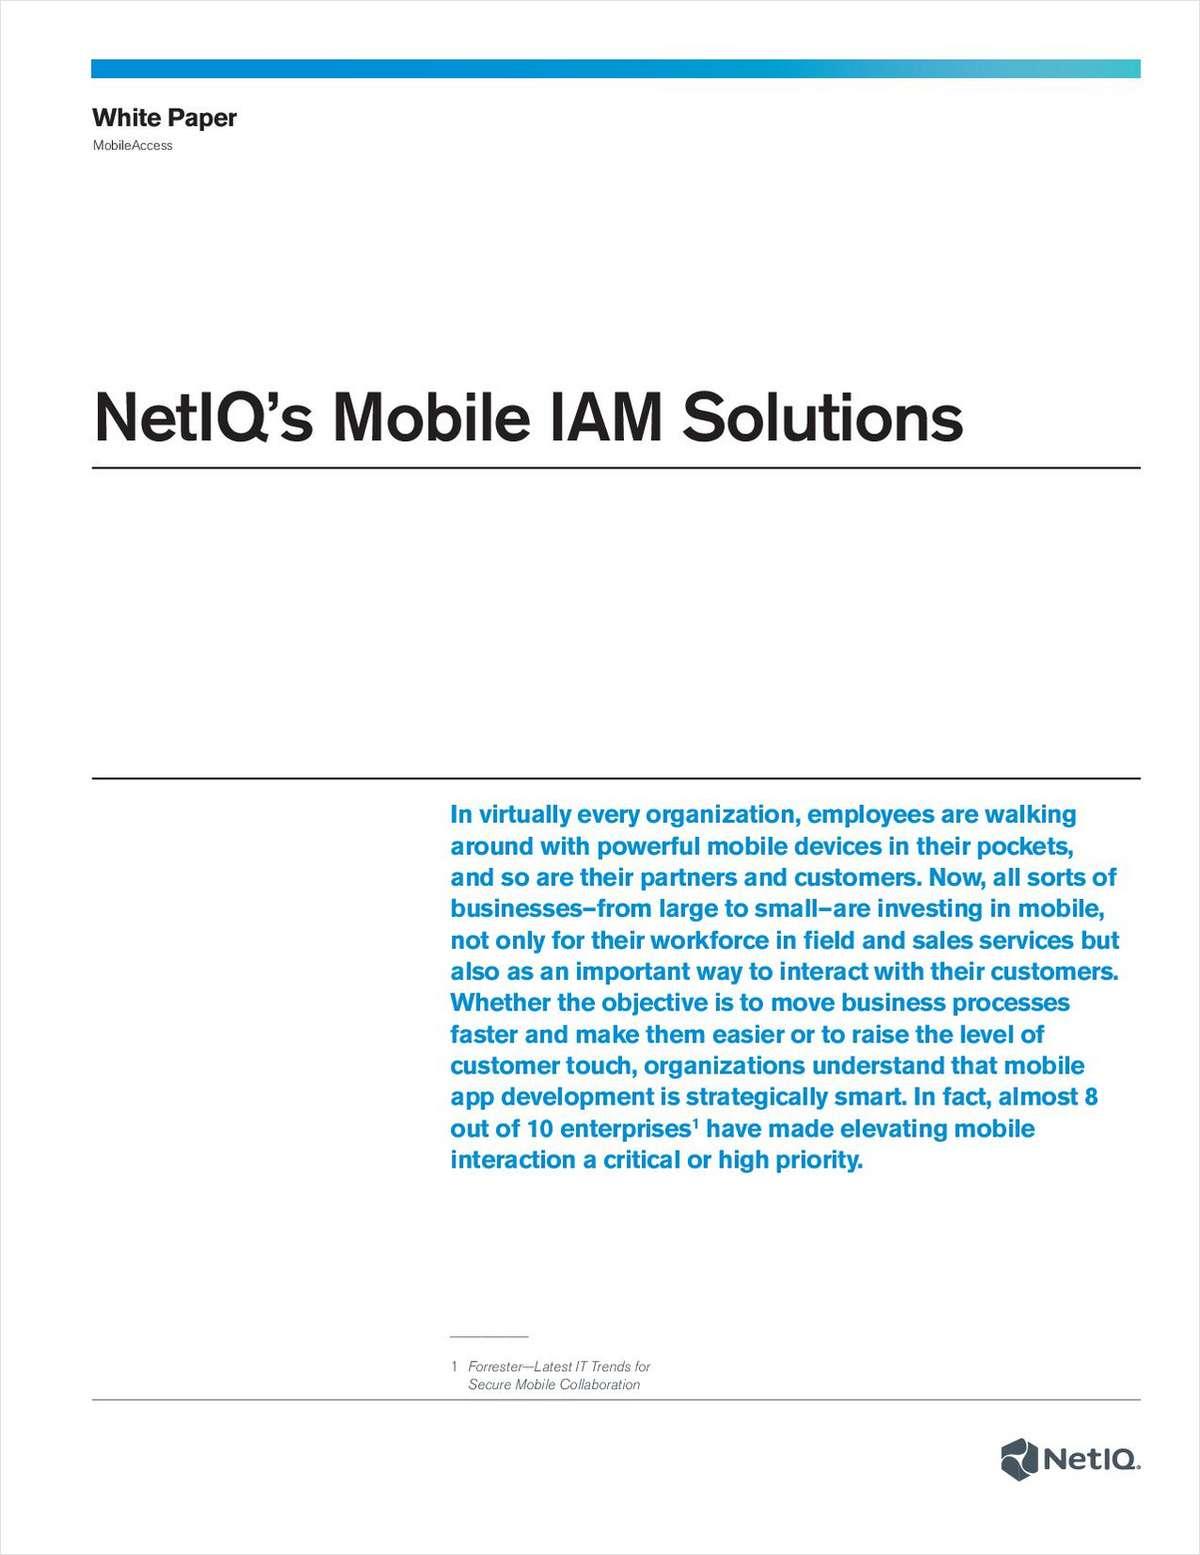 NetIQ's Mobile IAM Solutions